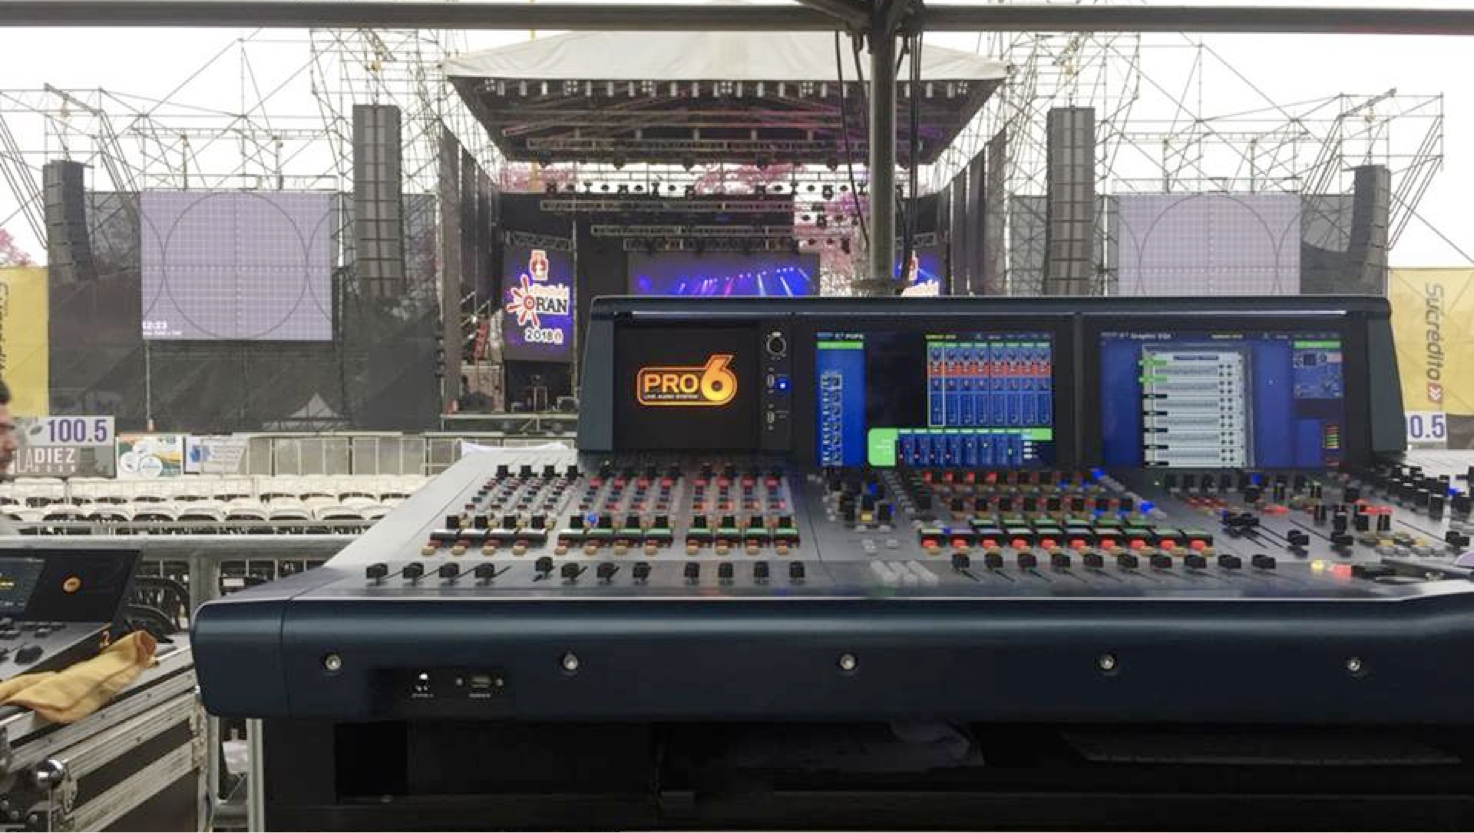 Fusion Black en el Festival ORÁN 2018